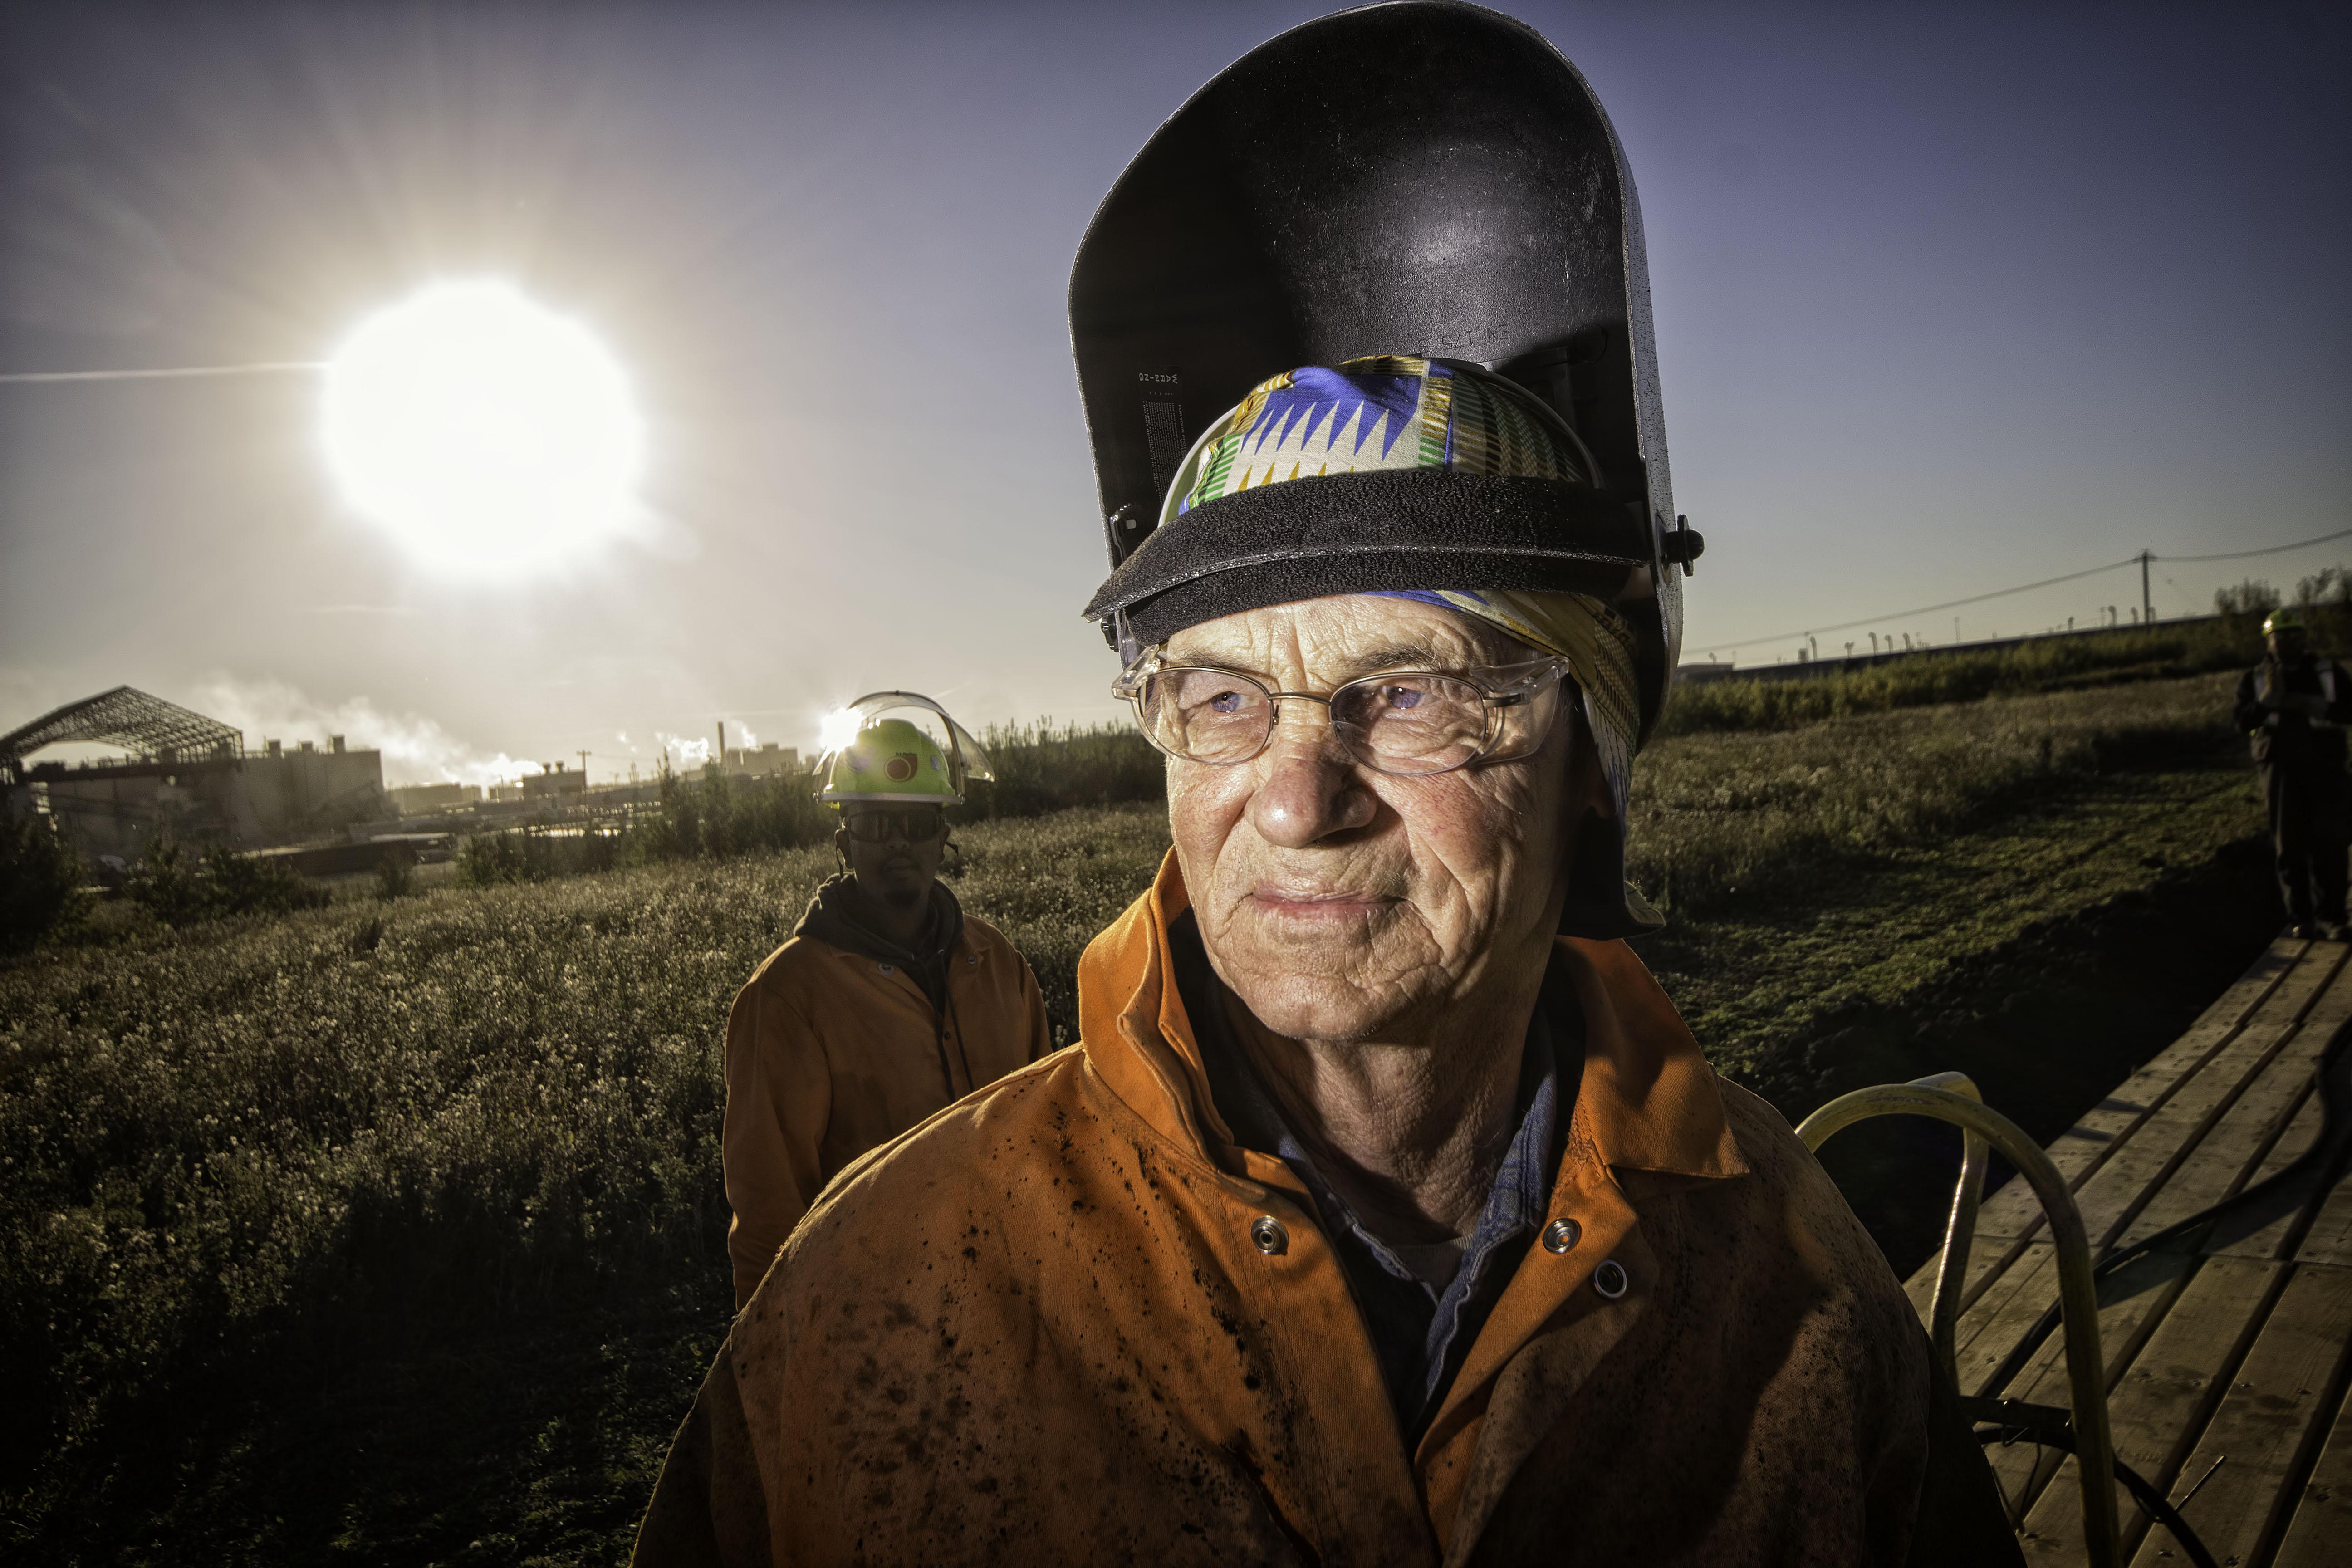 Pipeline Photography 12